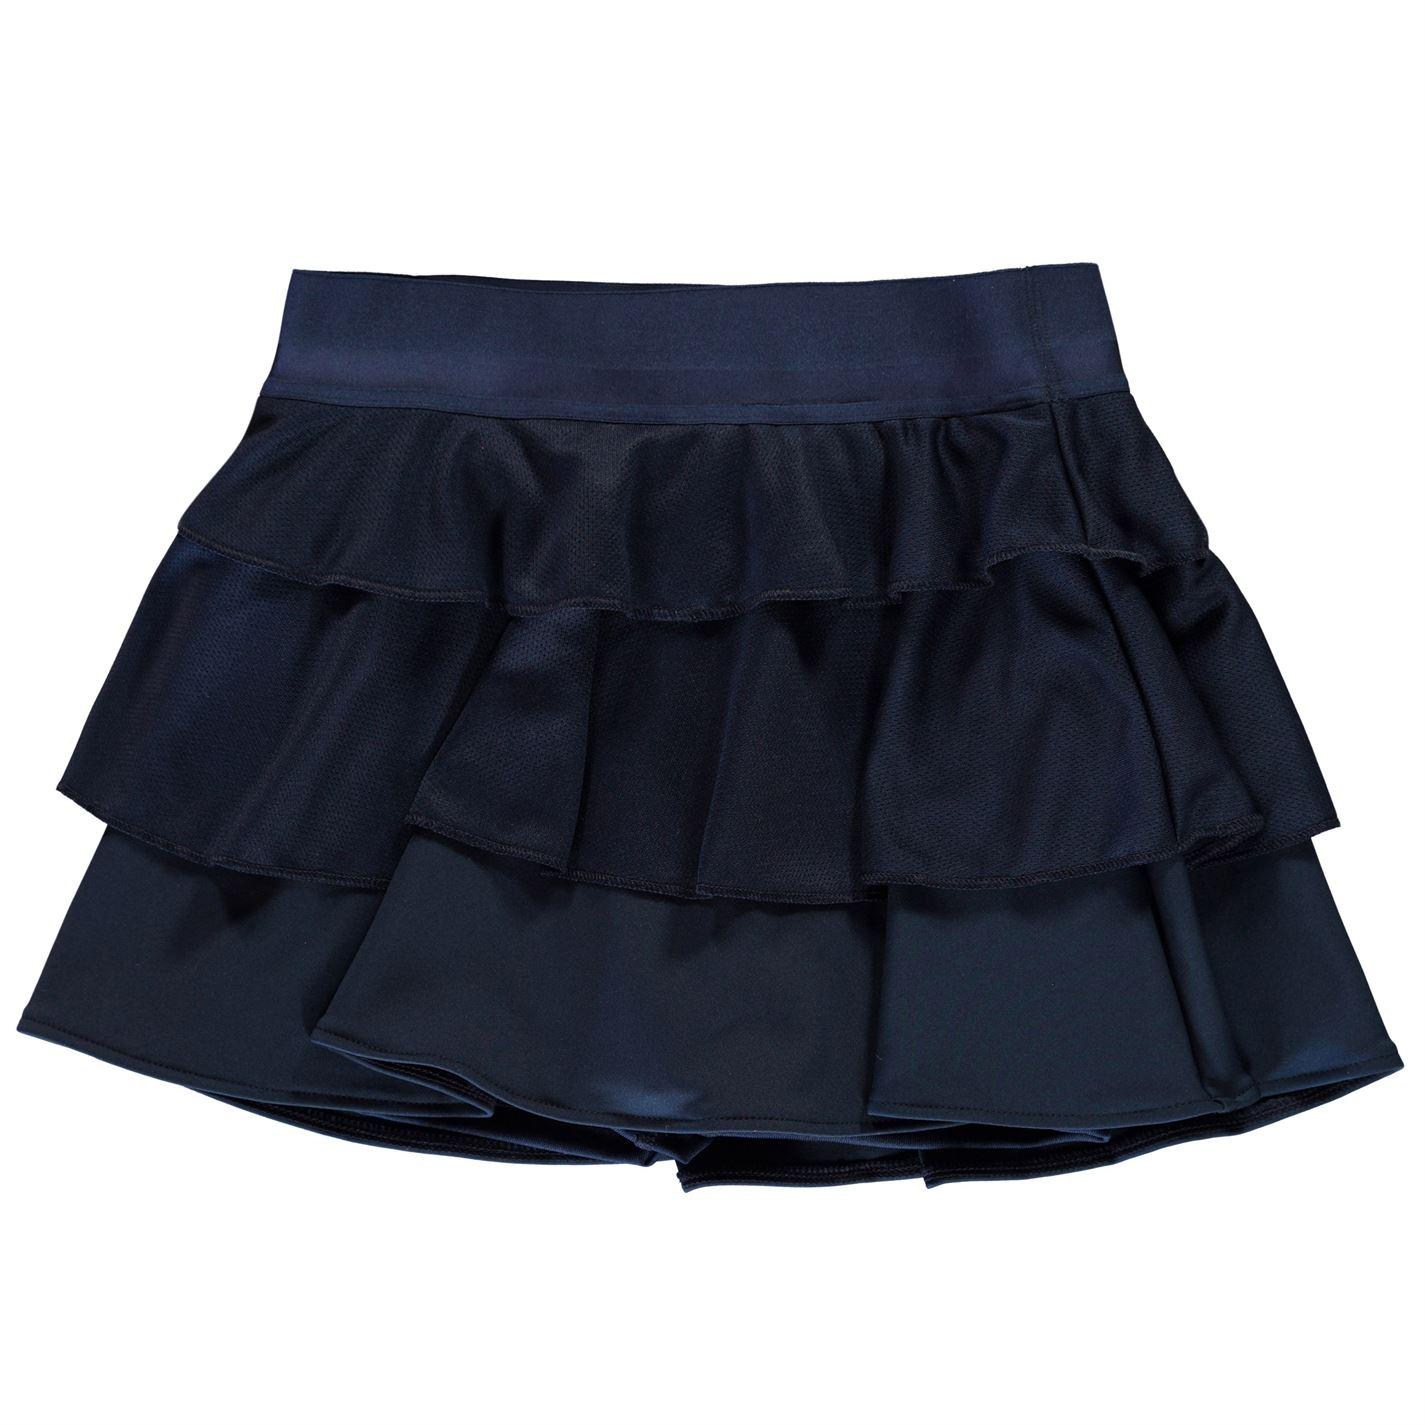 Adidas Frilly Tennis Skirt Junior Girls